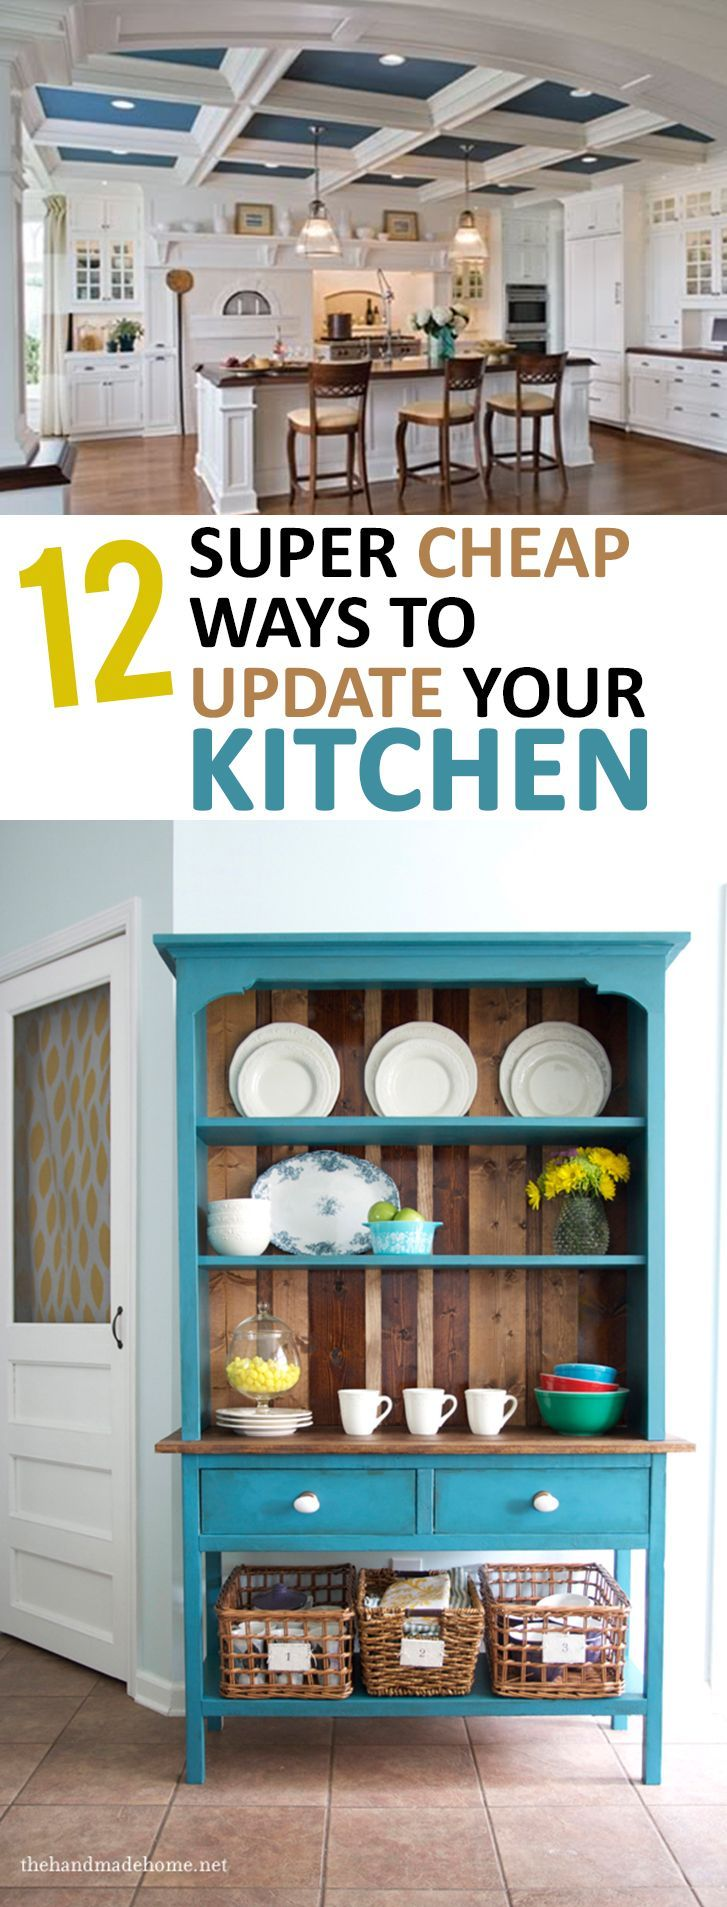 38 best Kitchen Remodeling images on Pinterest | Dream kitchens ...